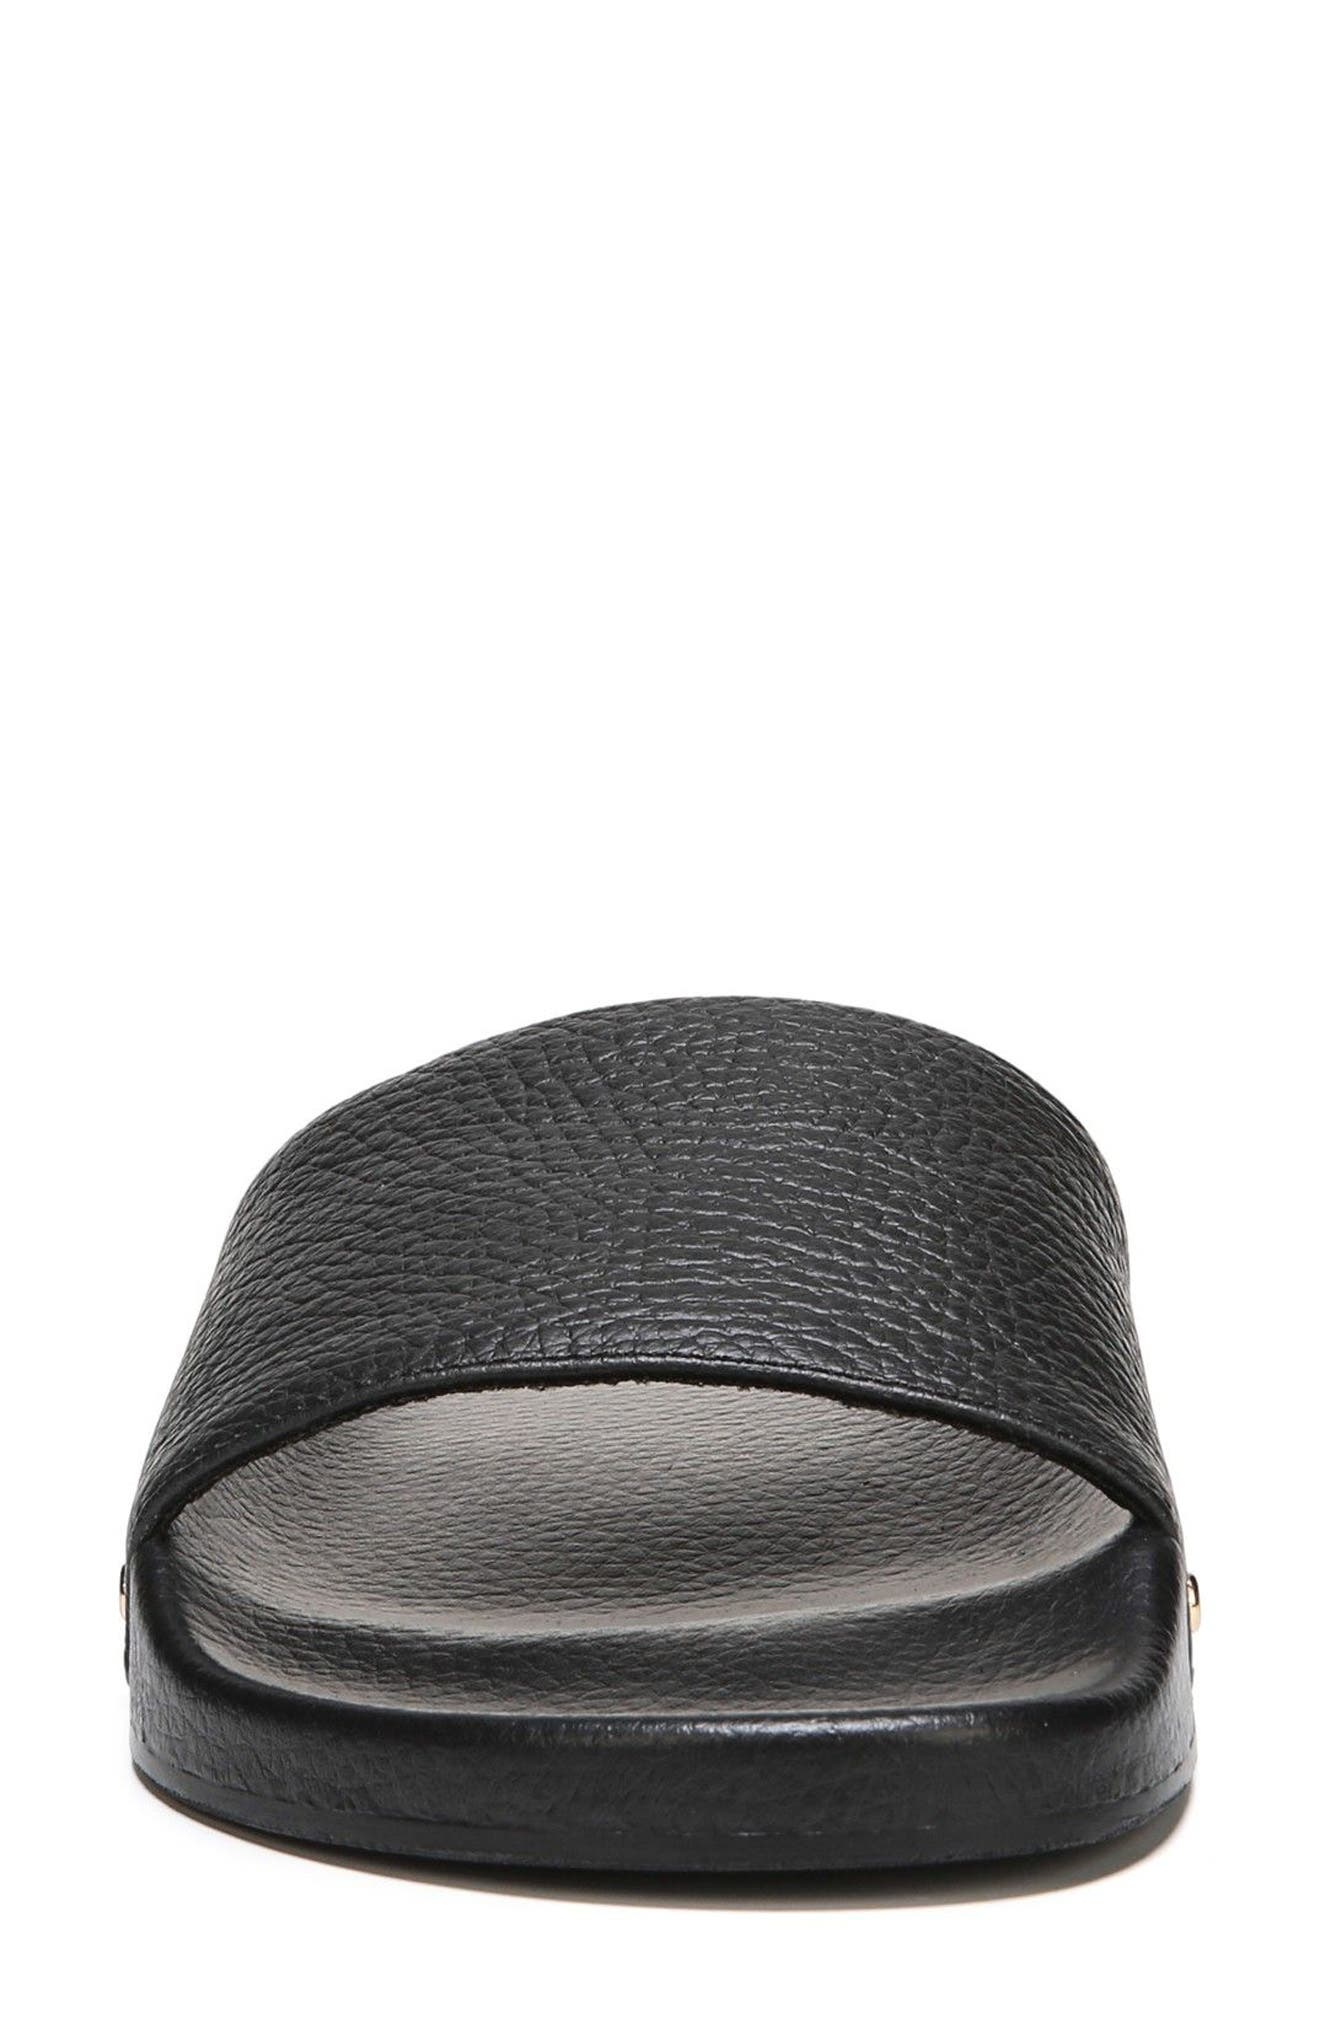 Pisces Slide Sandal,                             Alternate thumbnail 4, color,                             Black Leather